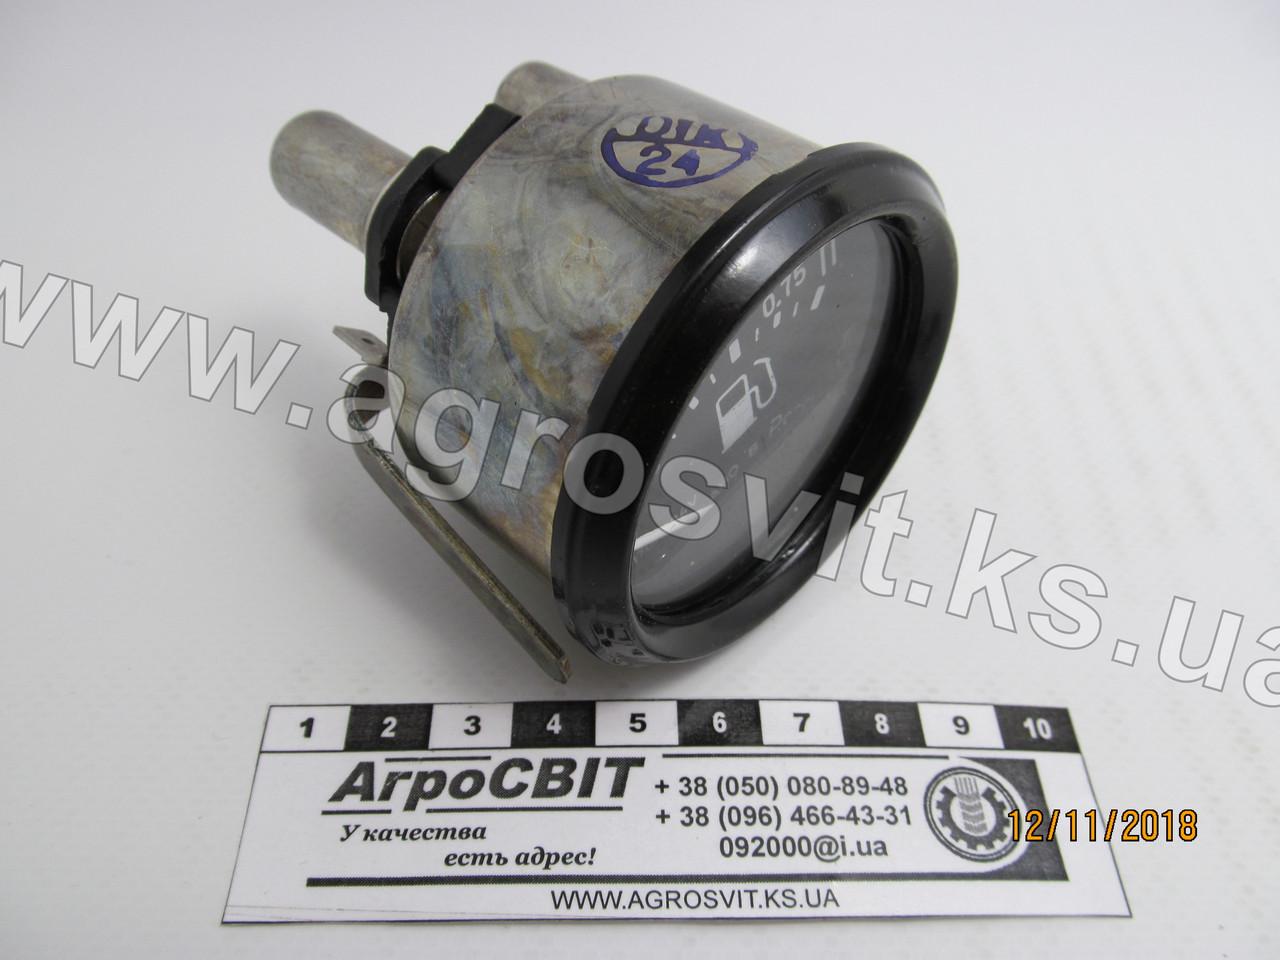 Указатель уровня топлива 24 V, УБ-170